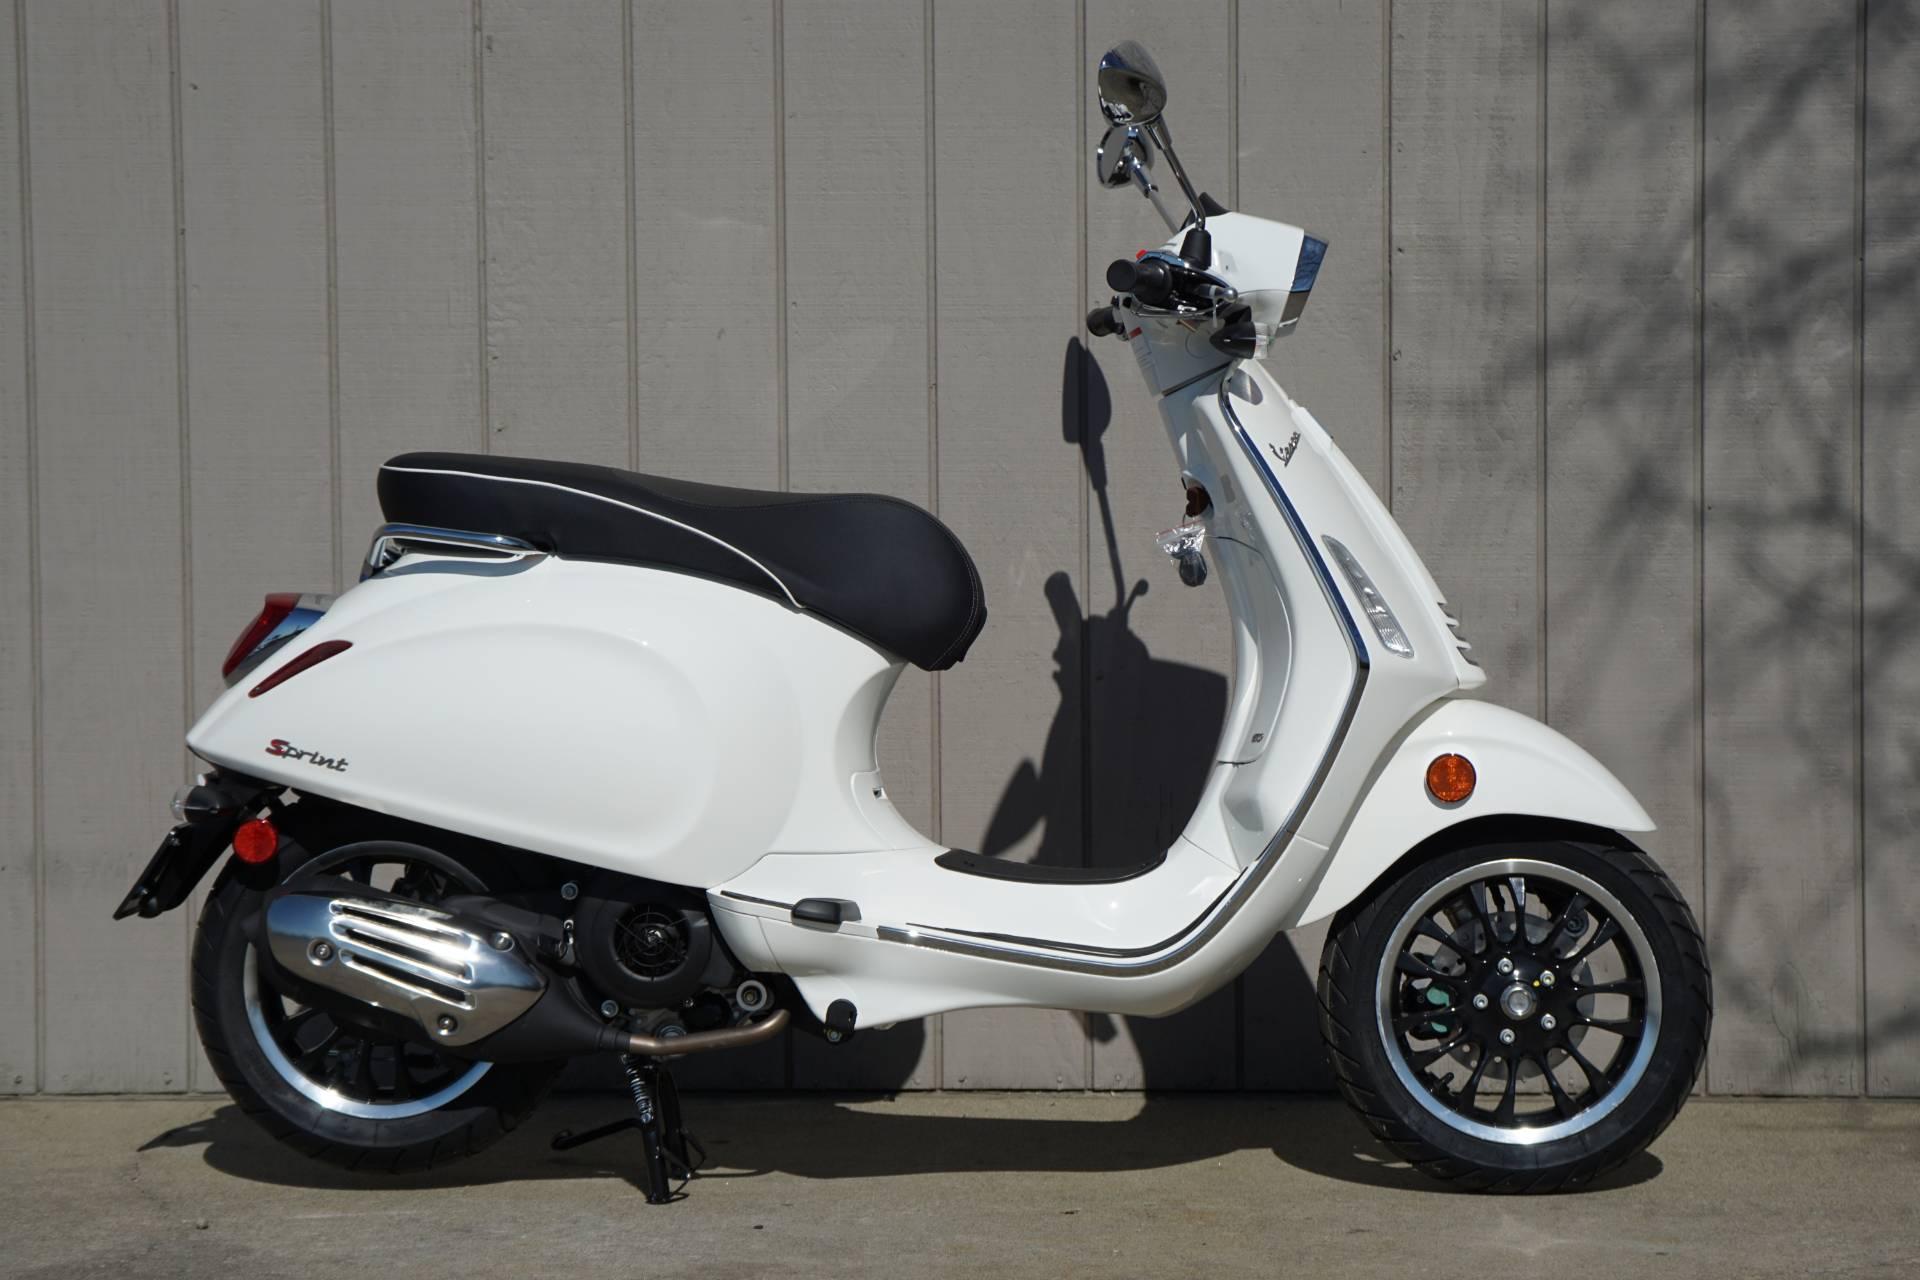 New 2019 Vespa Sprint 150 Scooters In Elk Grove, CA